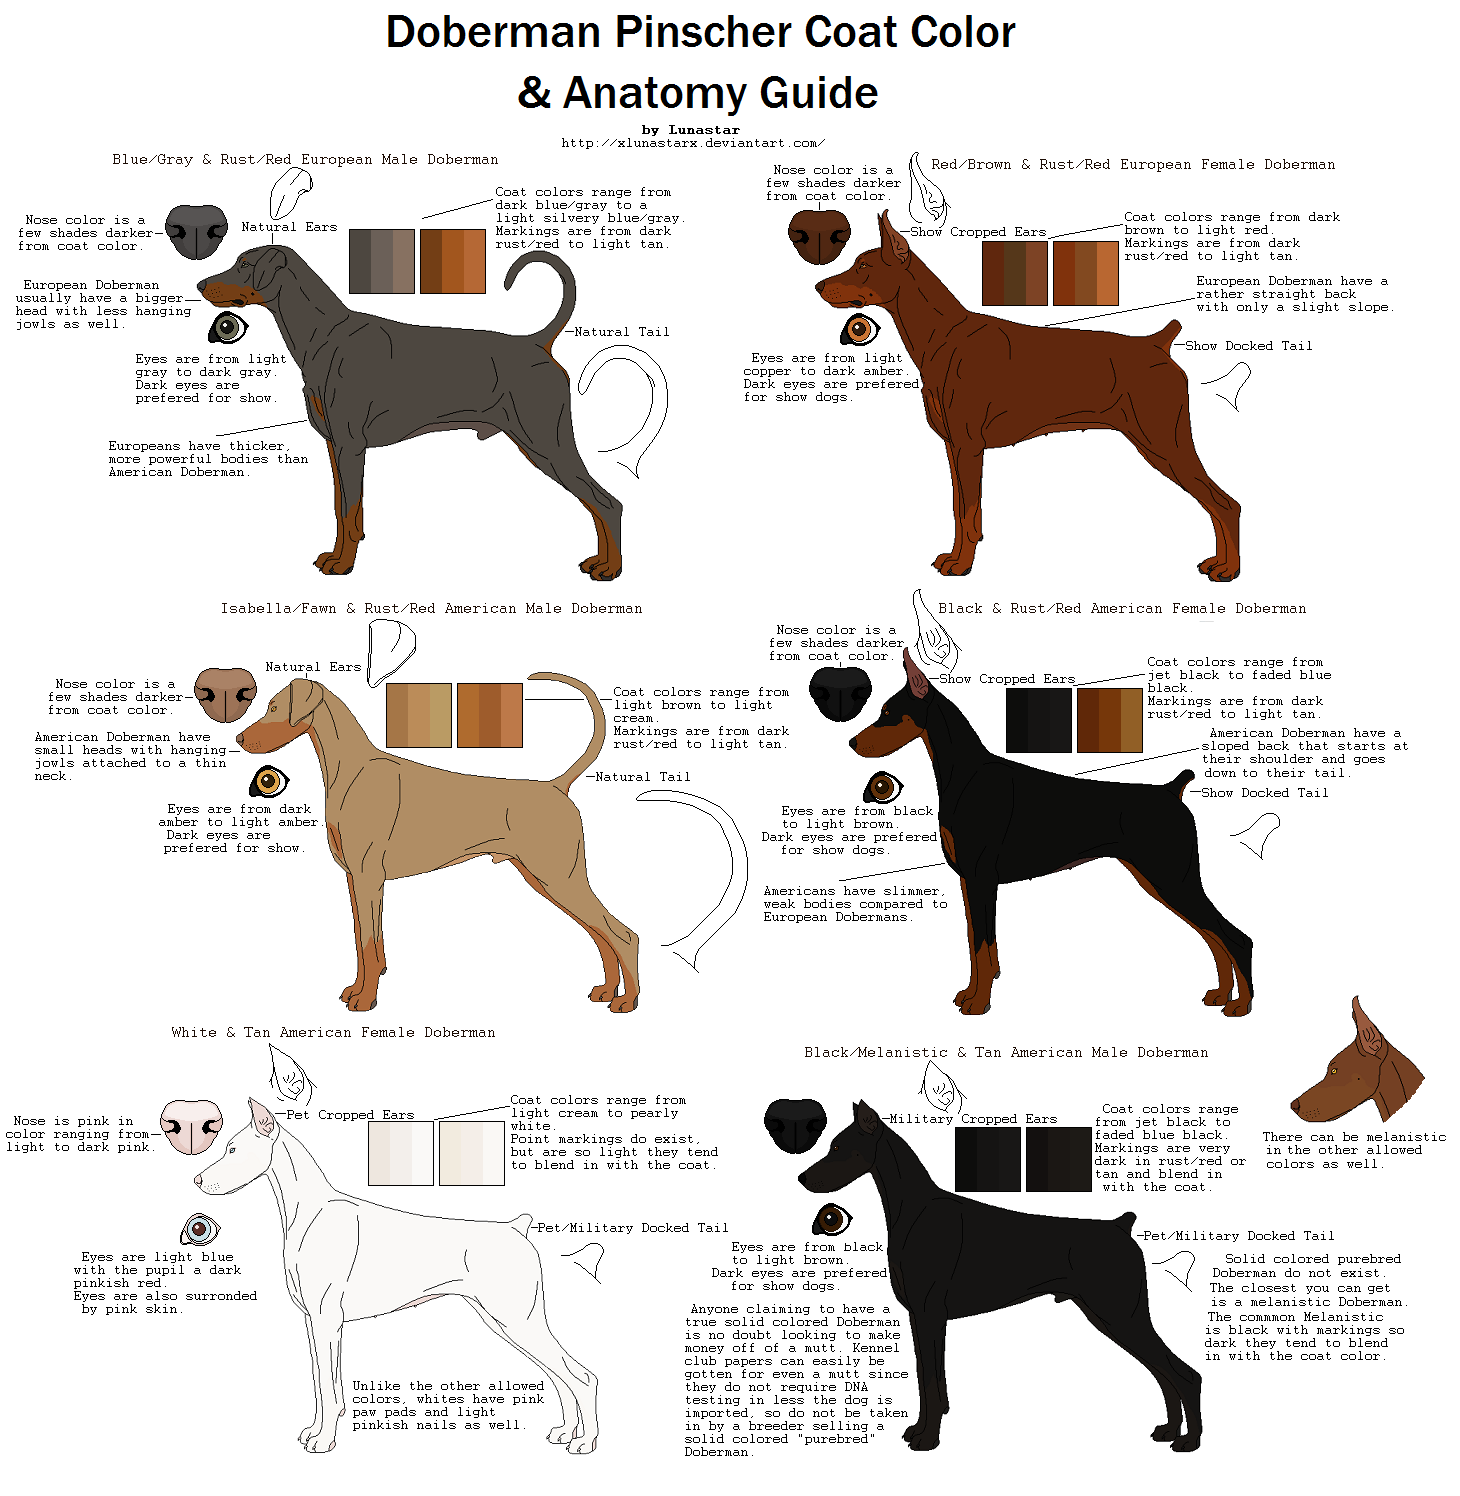 Doberman Pinscher Coat Color and Anatomy Guide by xLunastarx | Dobie ...